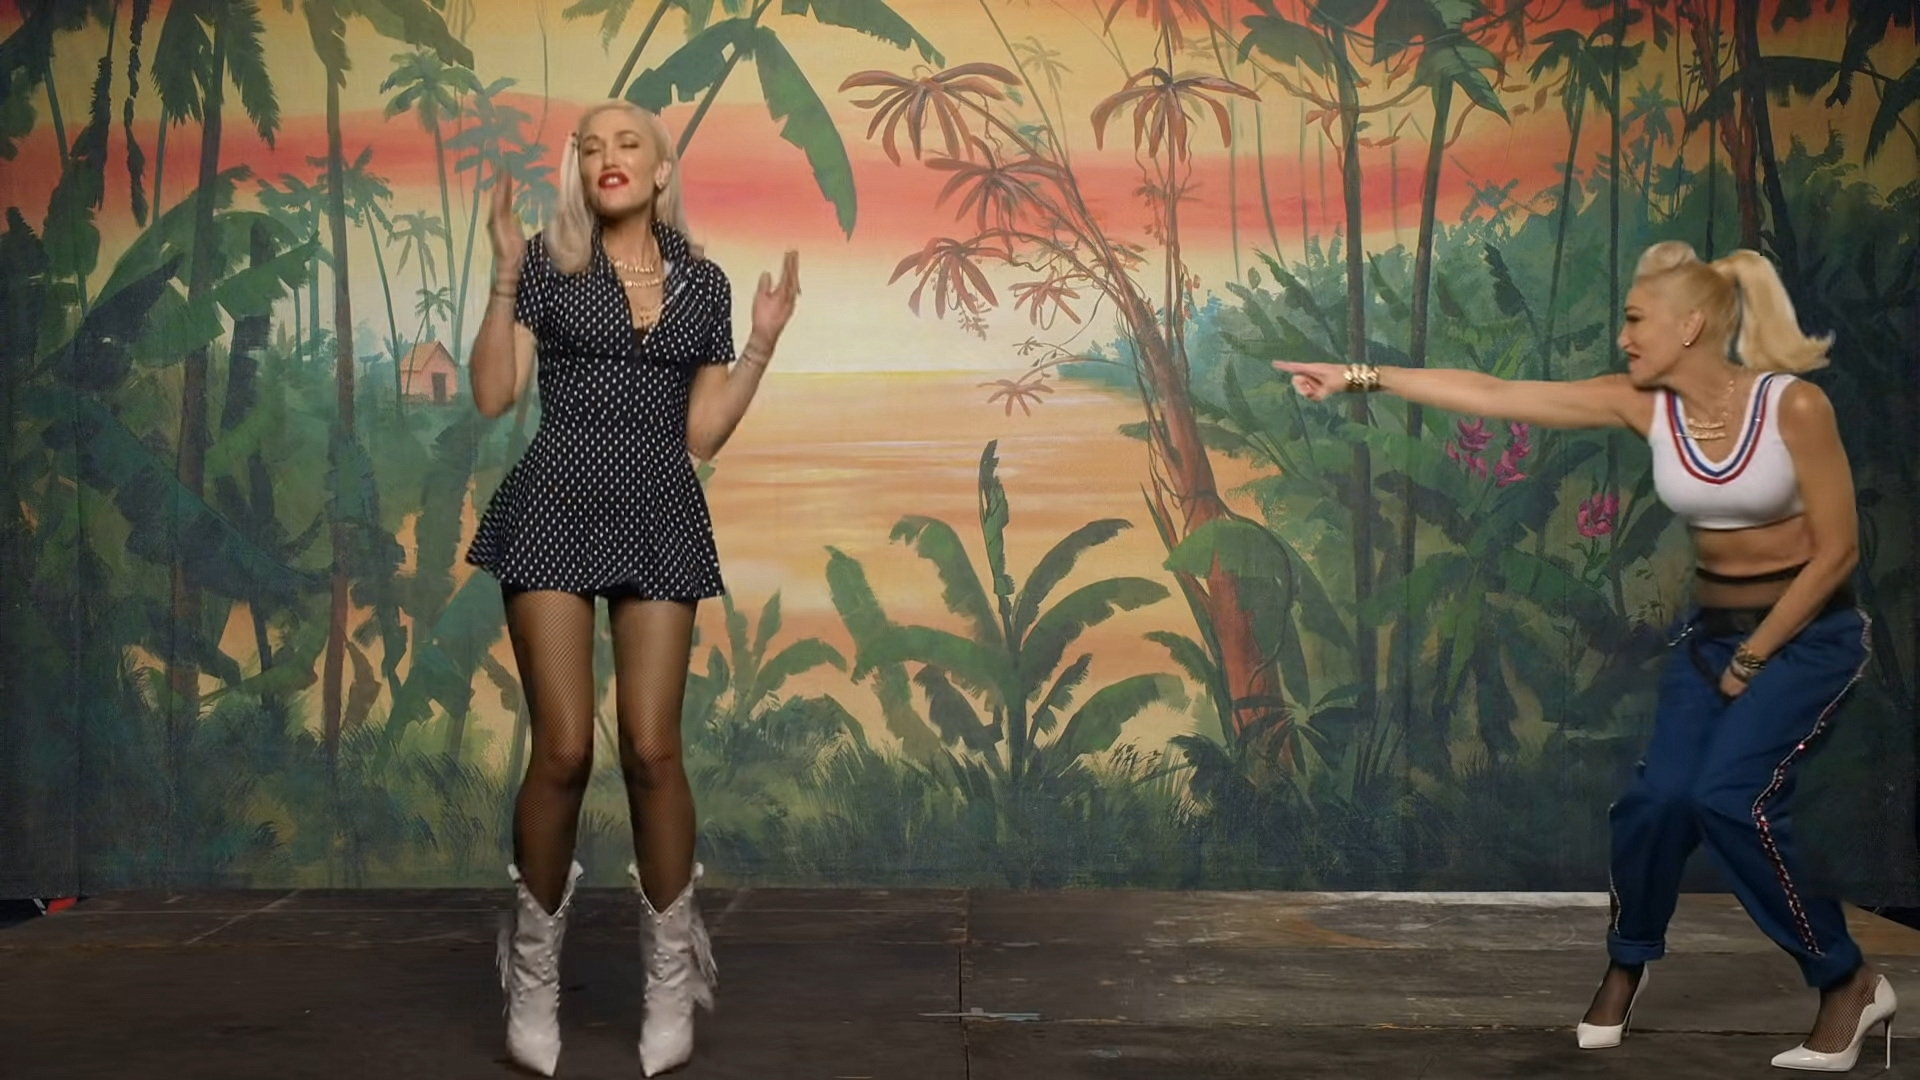 Gwen Stefani - Let Me Reintroduce Myself (Official Video) 2-15 Screenshot